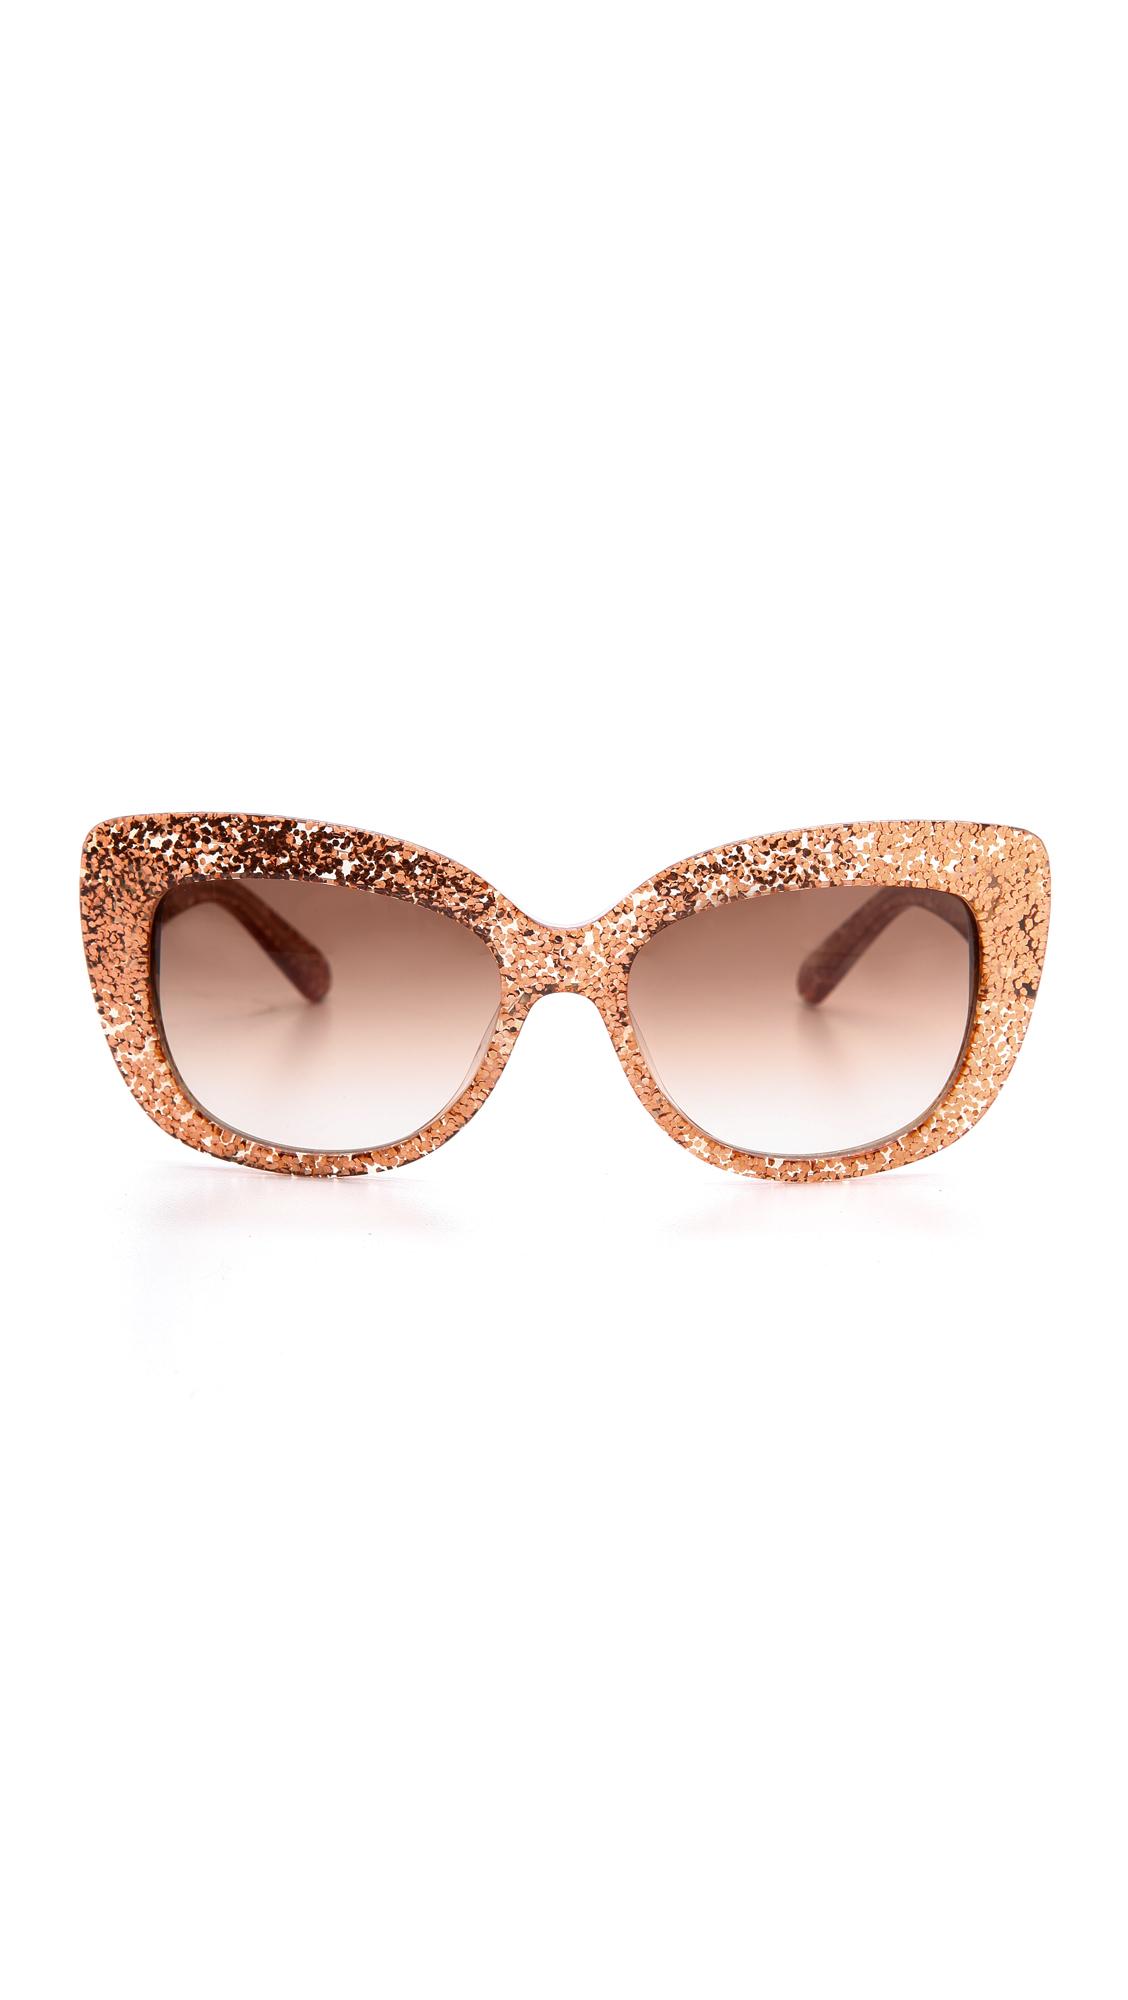 85d9d99d12 Kate spade ursula glitter cat eye sunglasses in pink lyst jpg 1128x2000 Kate  spade frames with